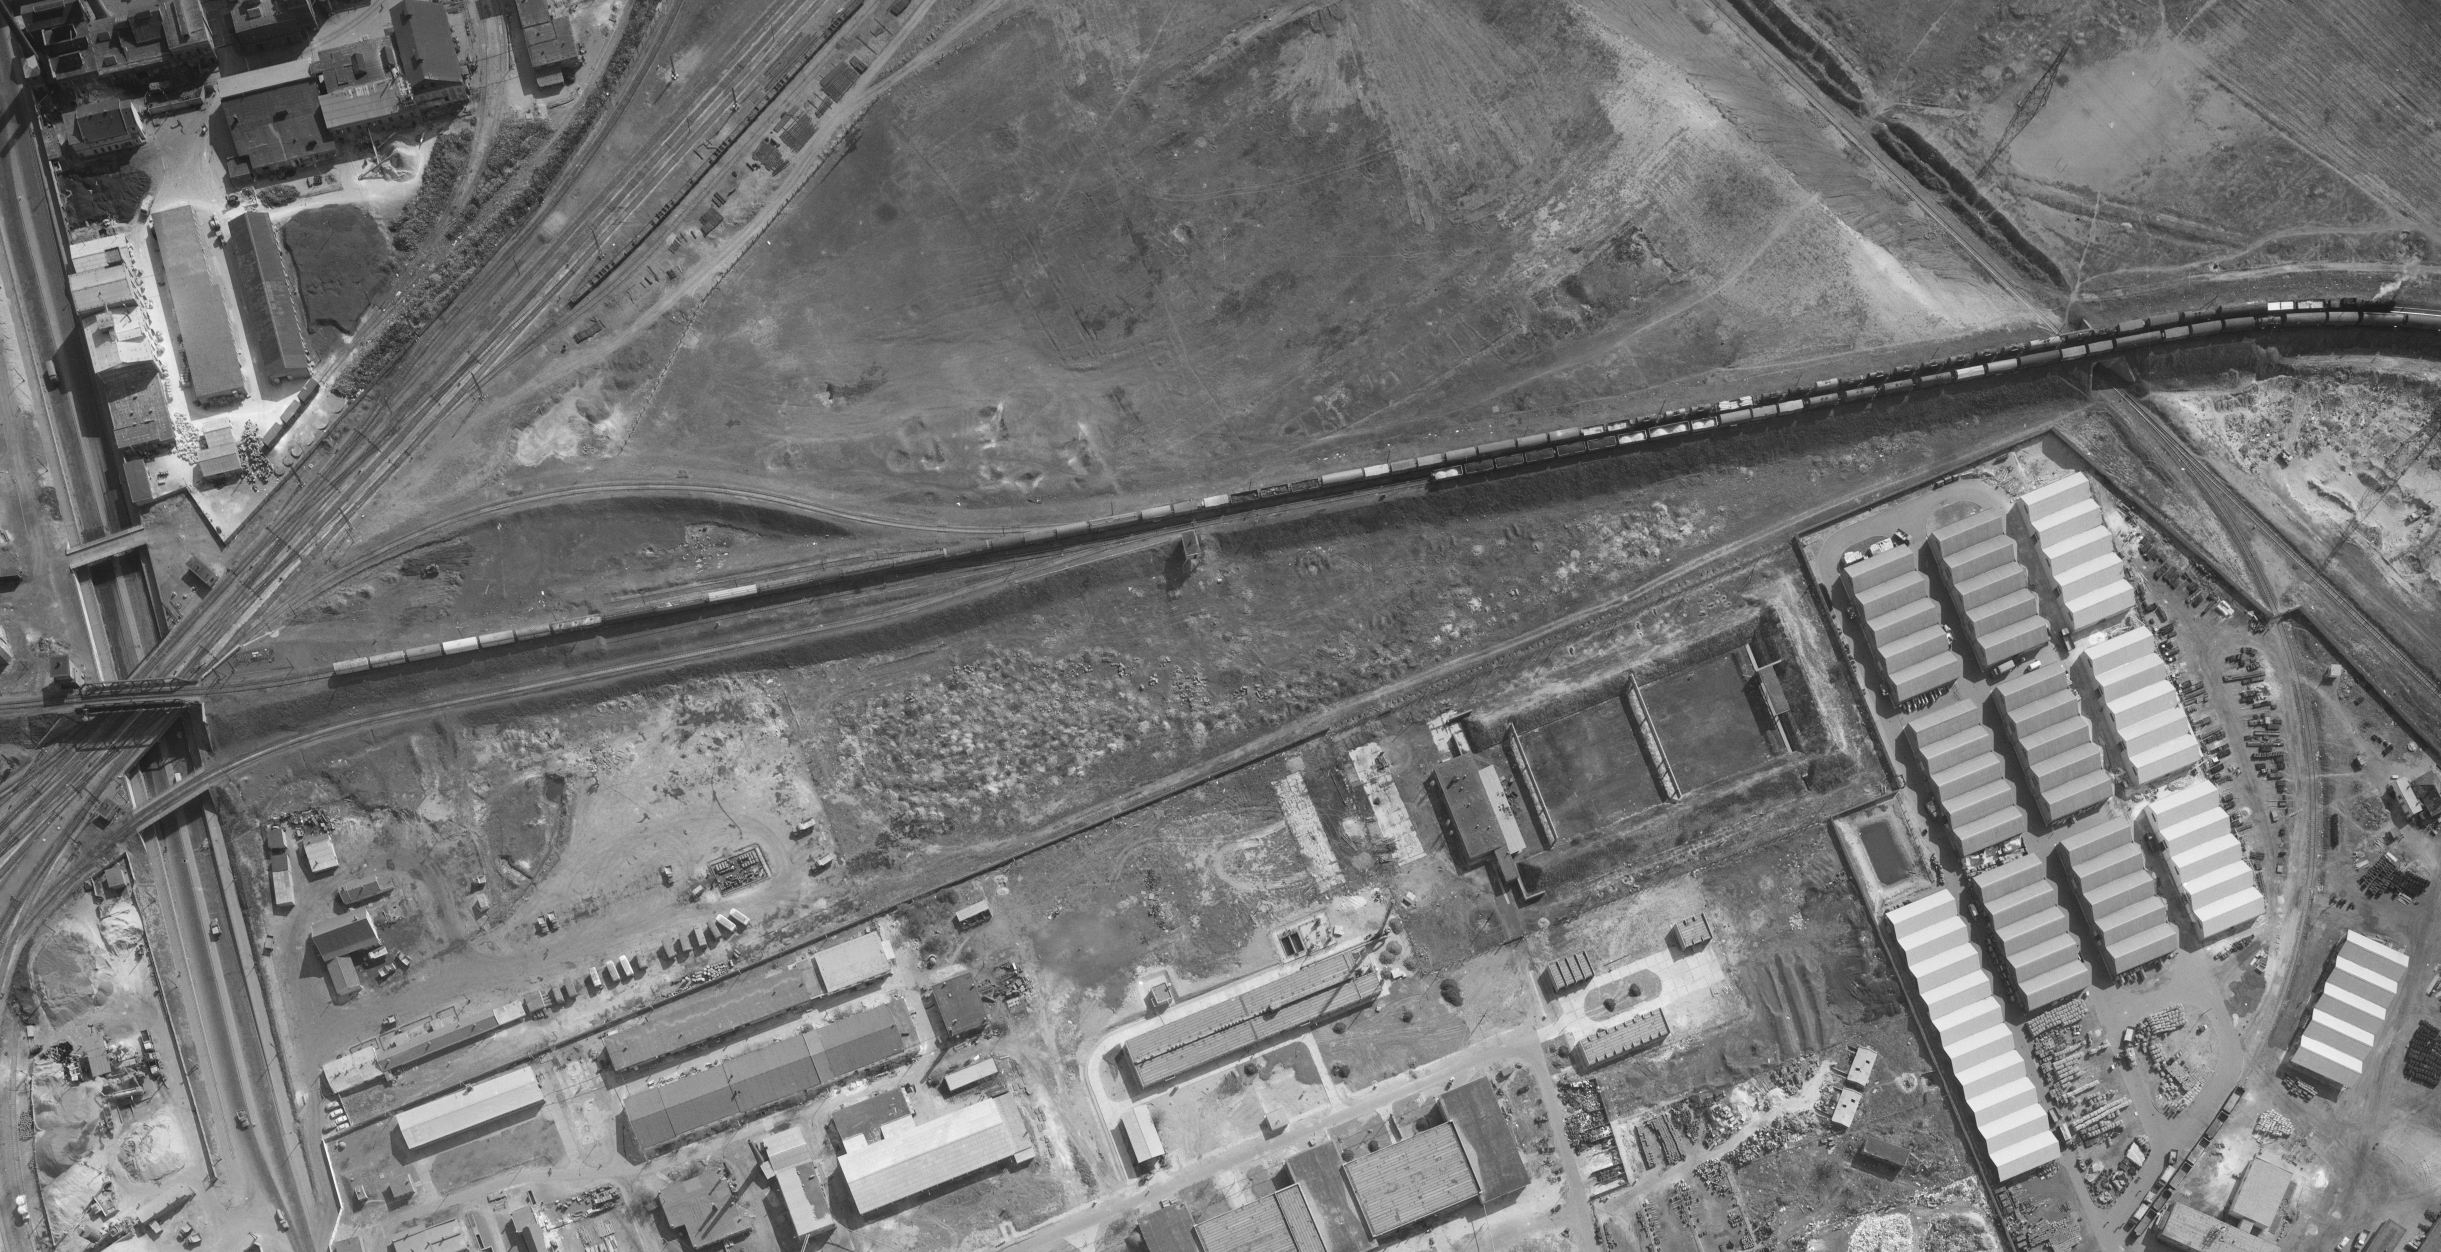 1972_0010_0441_vonat_58kocsi.JPG